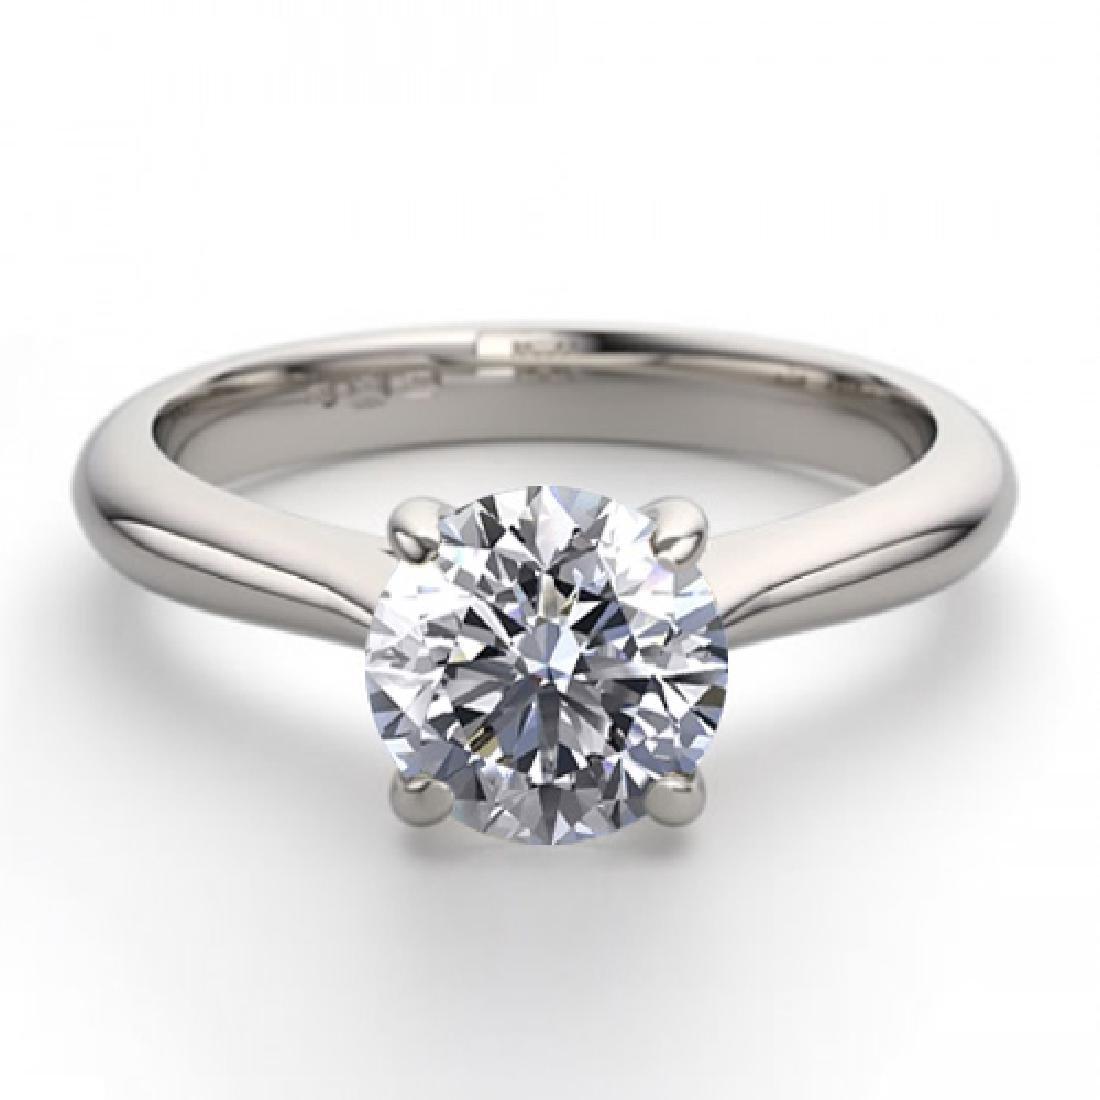 18K White Gold Jewelry 1.52 ctw Natural Diamond